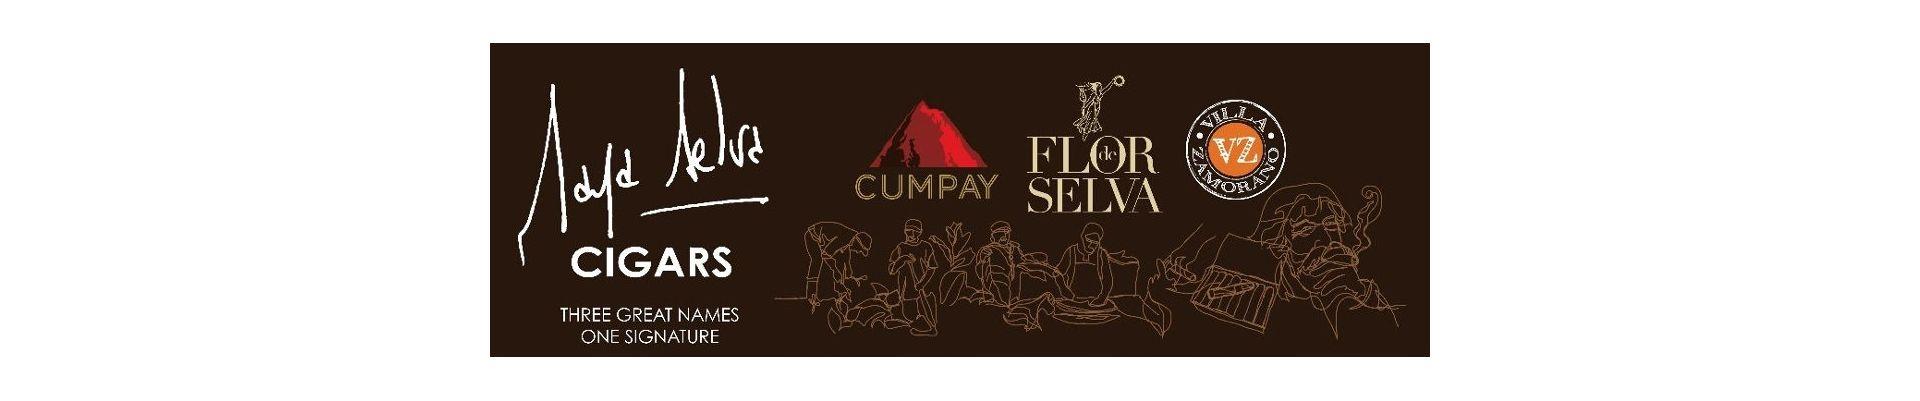 Trabucuri Flor De Selva Honduras trabucuri Churchill Flor De Selva